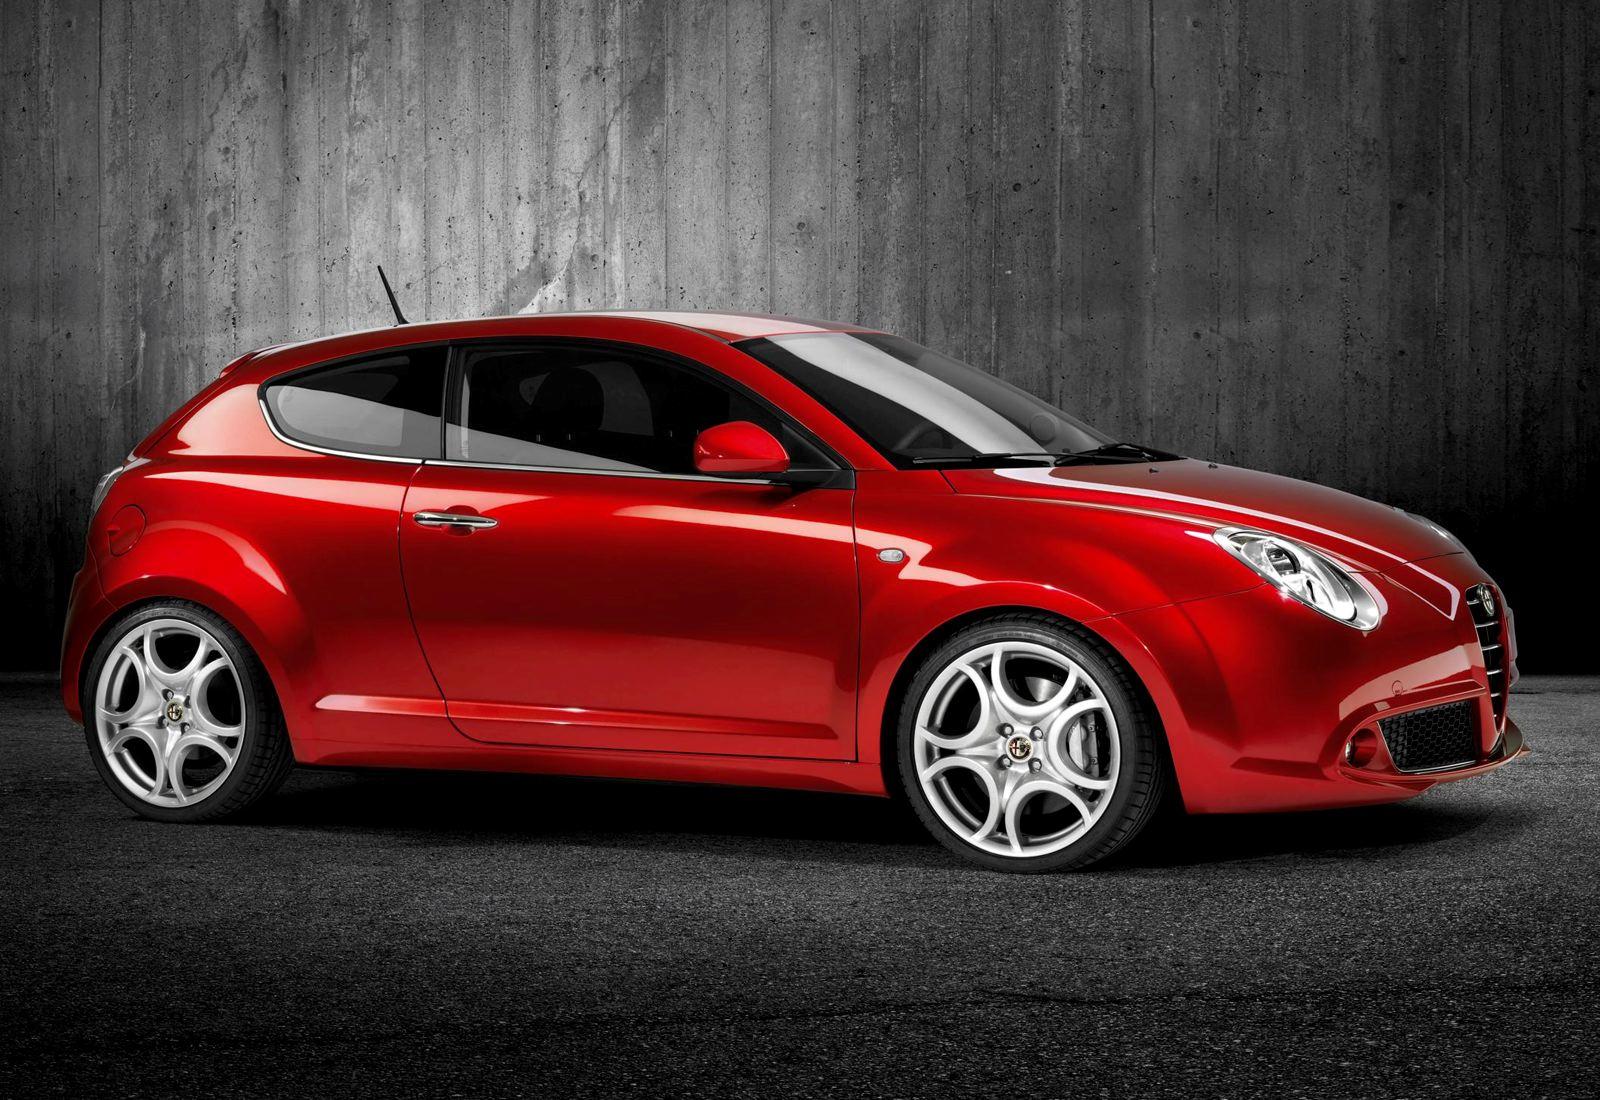 Hot-Hatch: Alfa Romeo MiTo 1.4 Turbo Sport ('08)